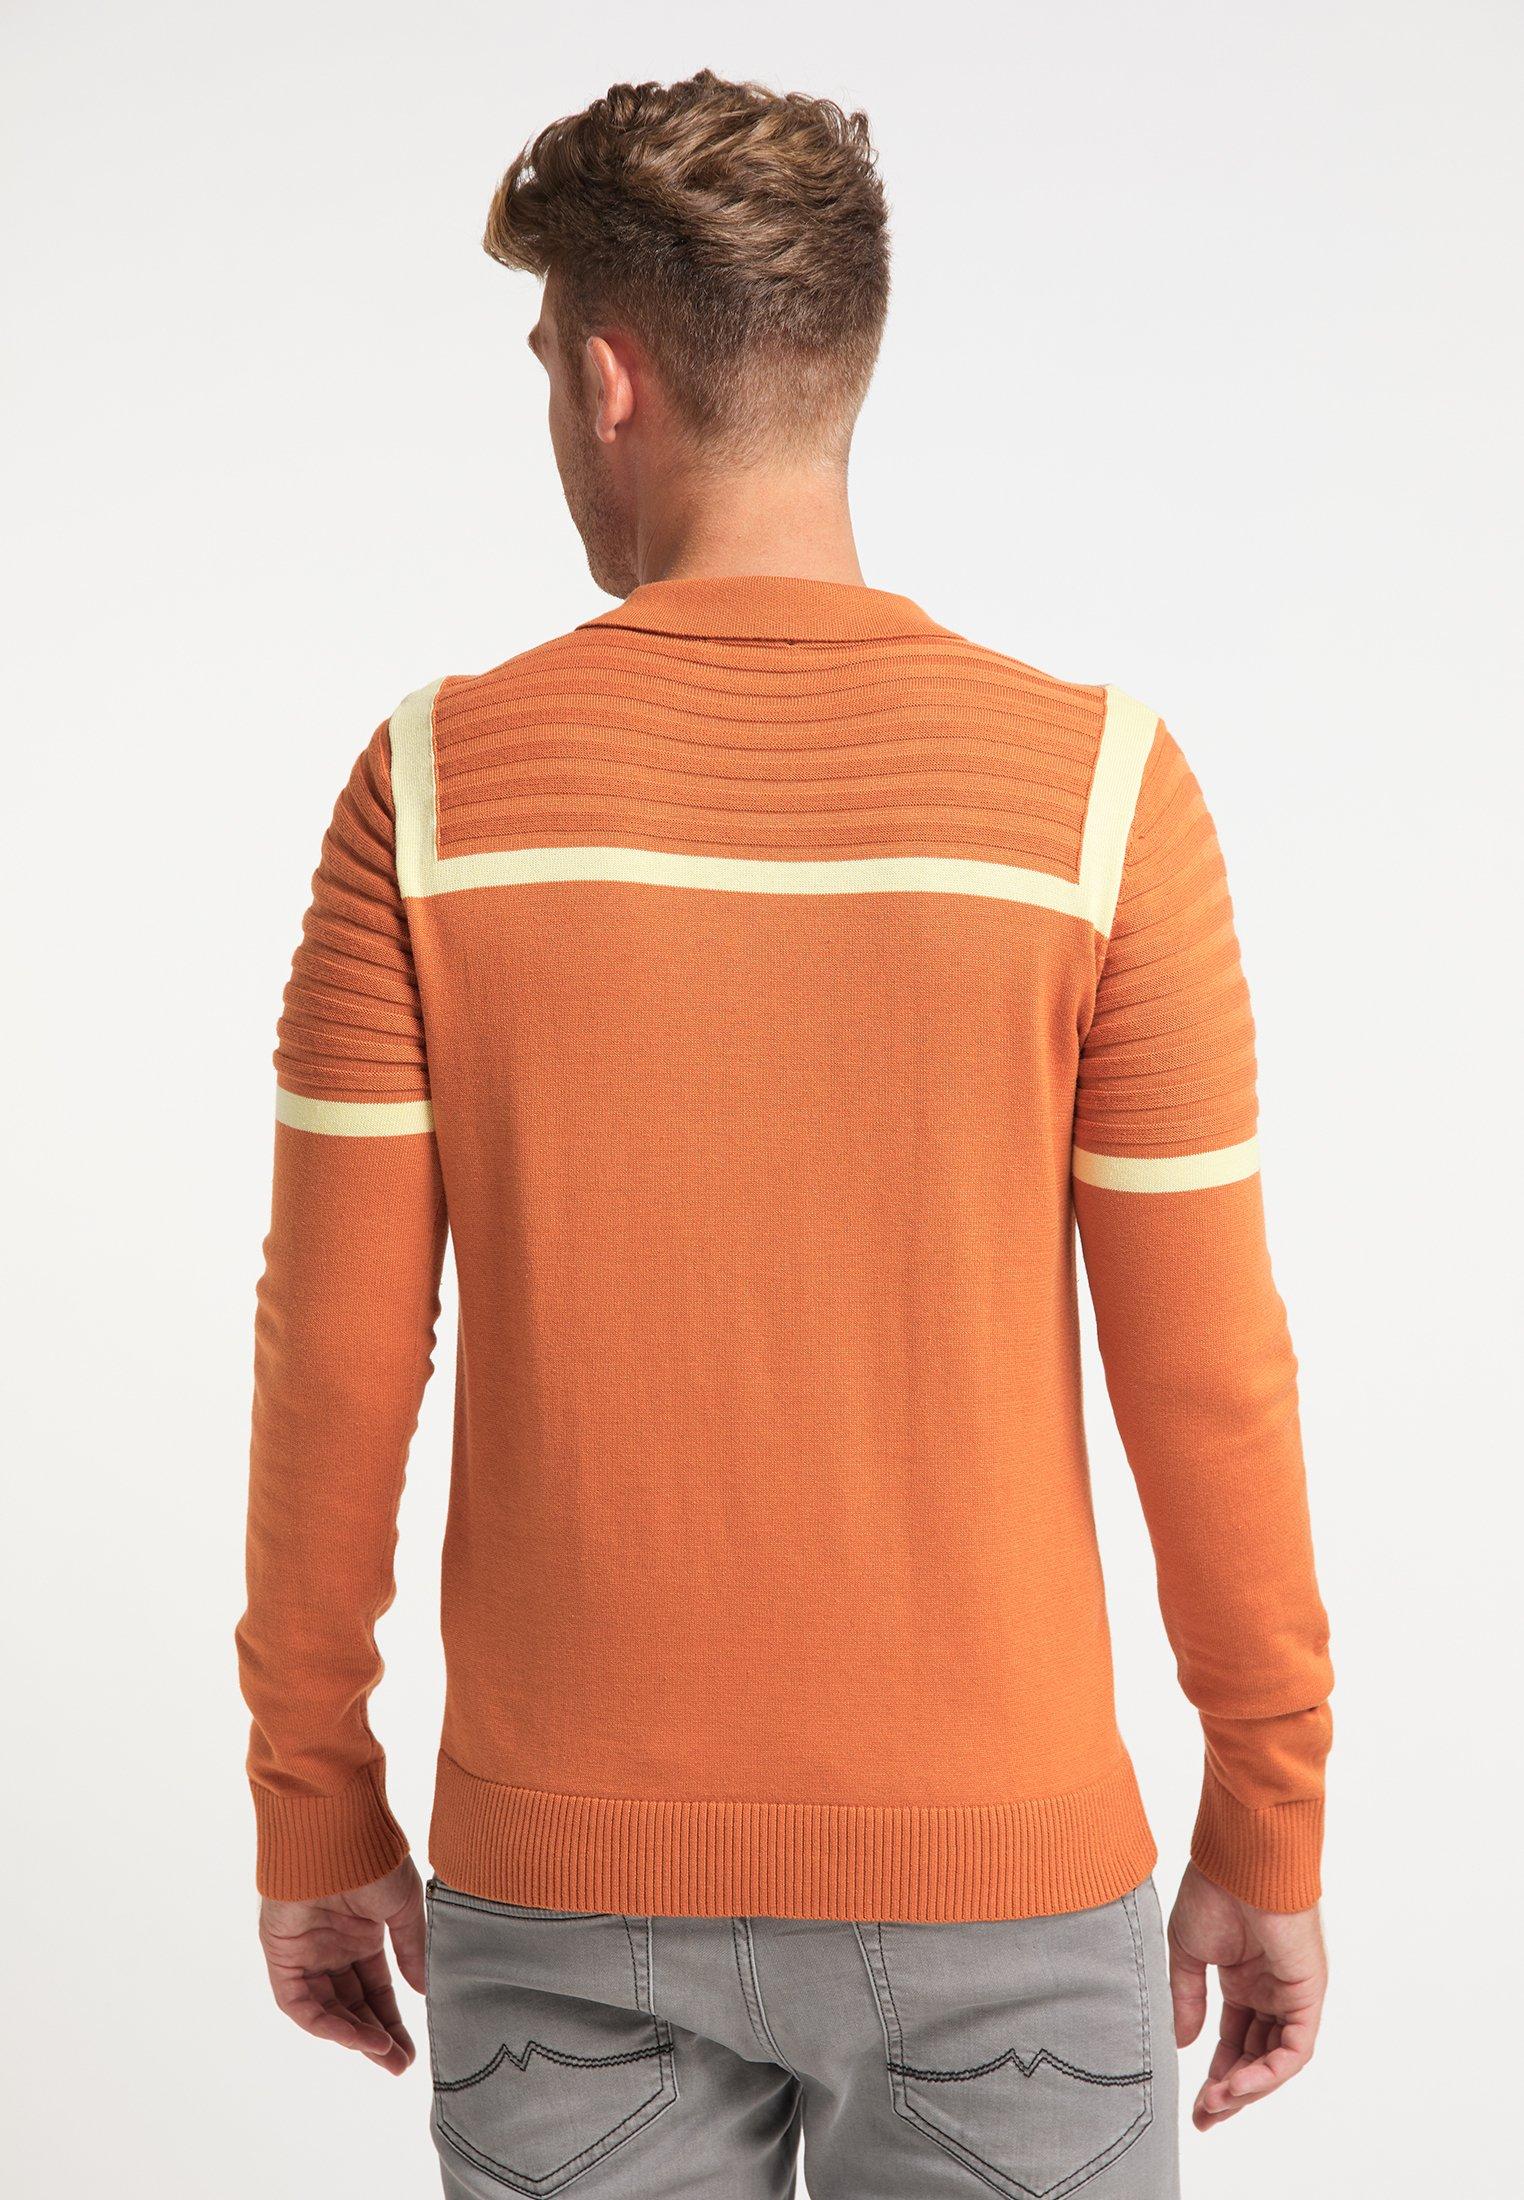 Mo Polo shirt - multicolor rost aUpPr